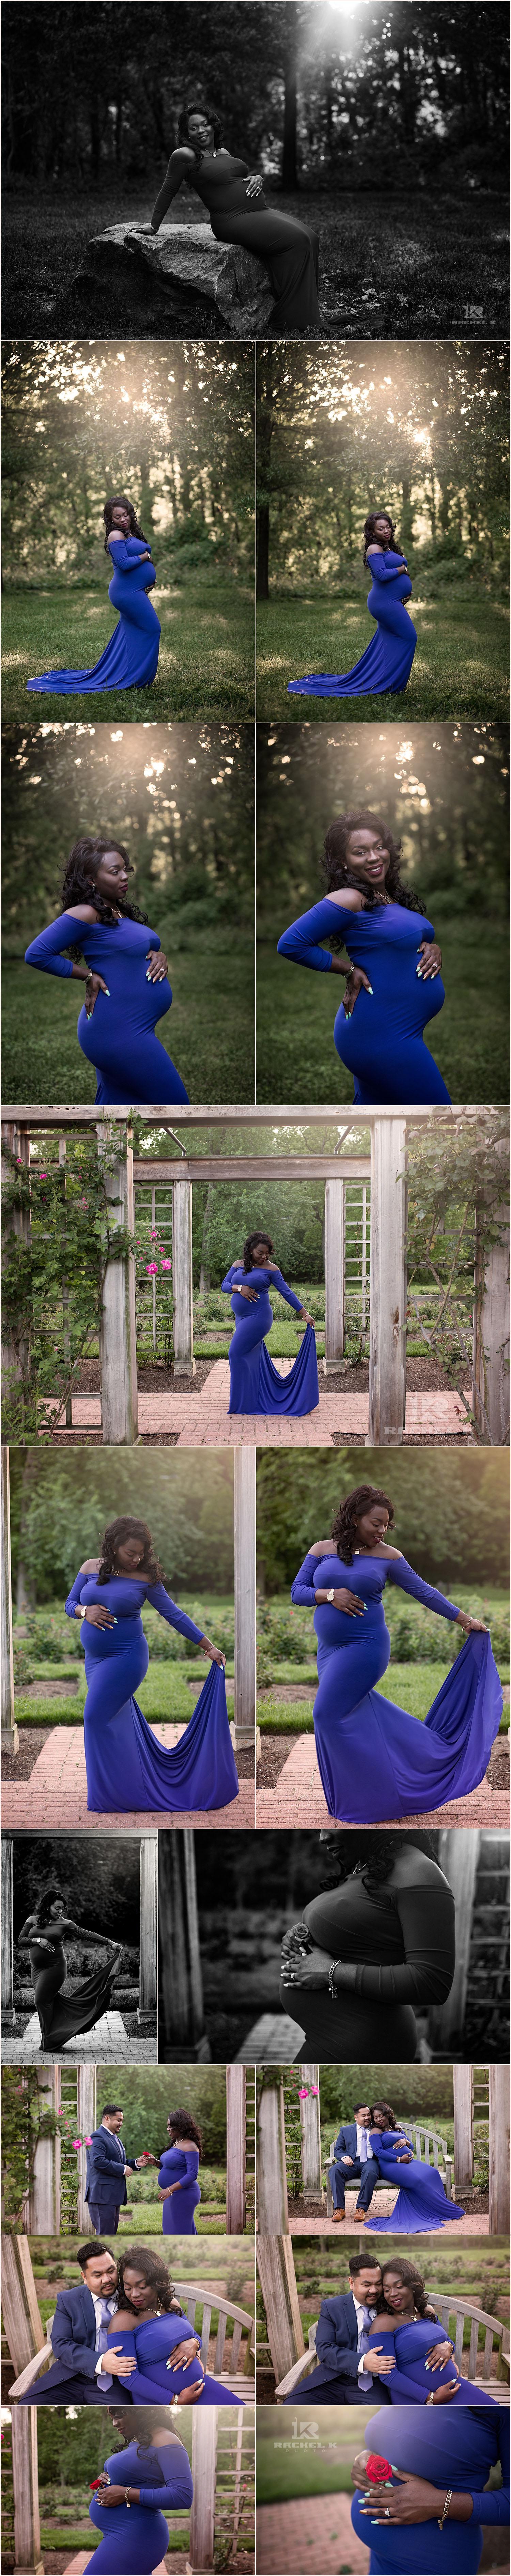 Arlington blue dress maternity session in rose garden by Rachel K Photo